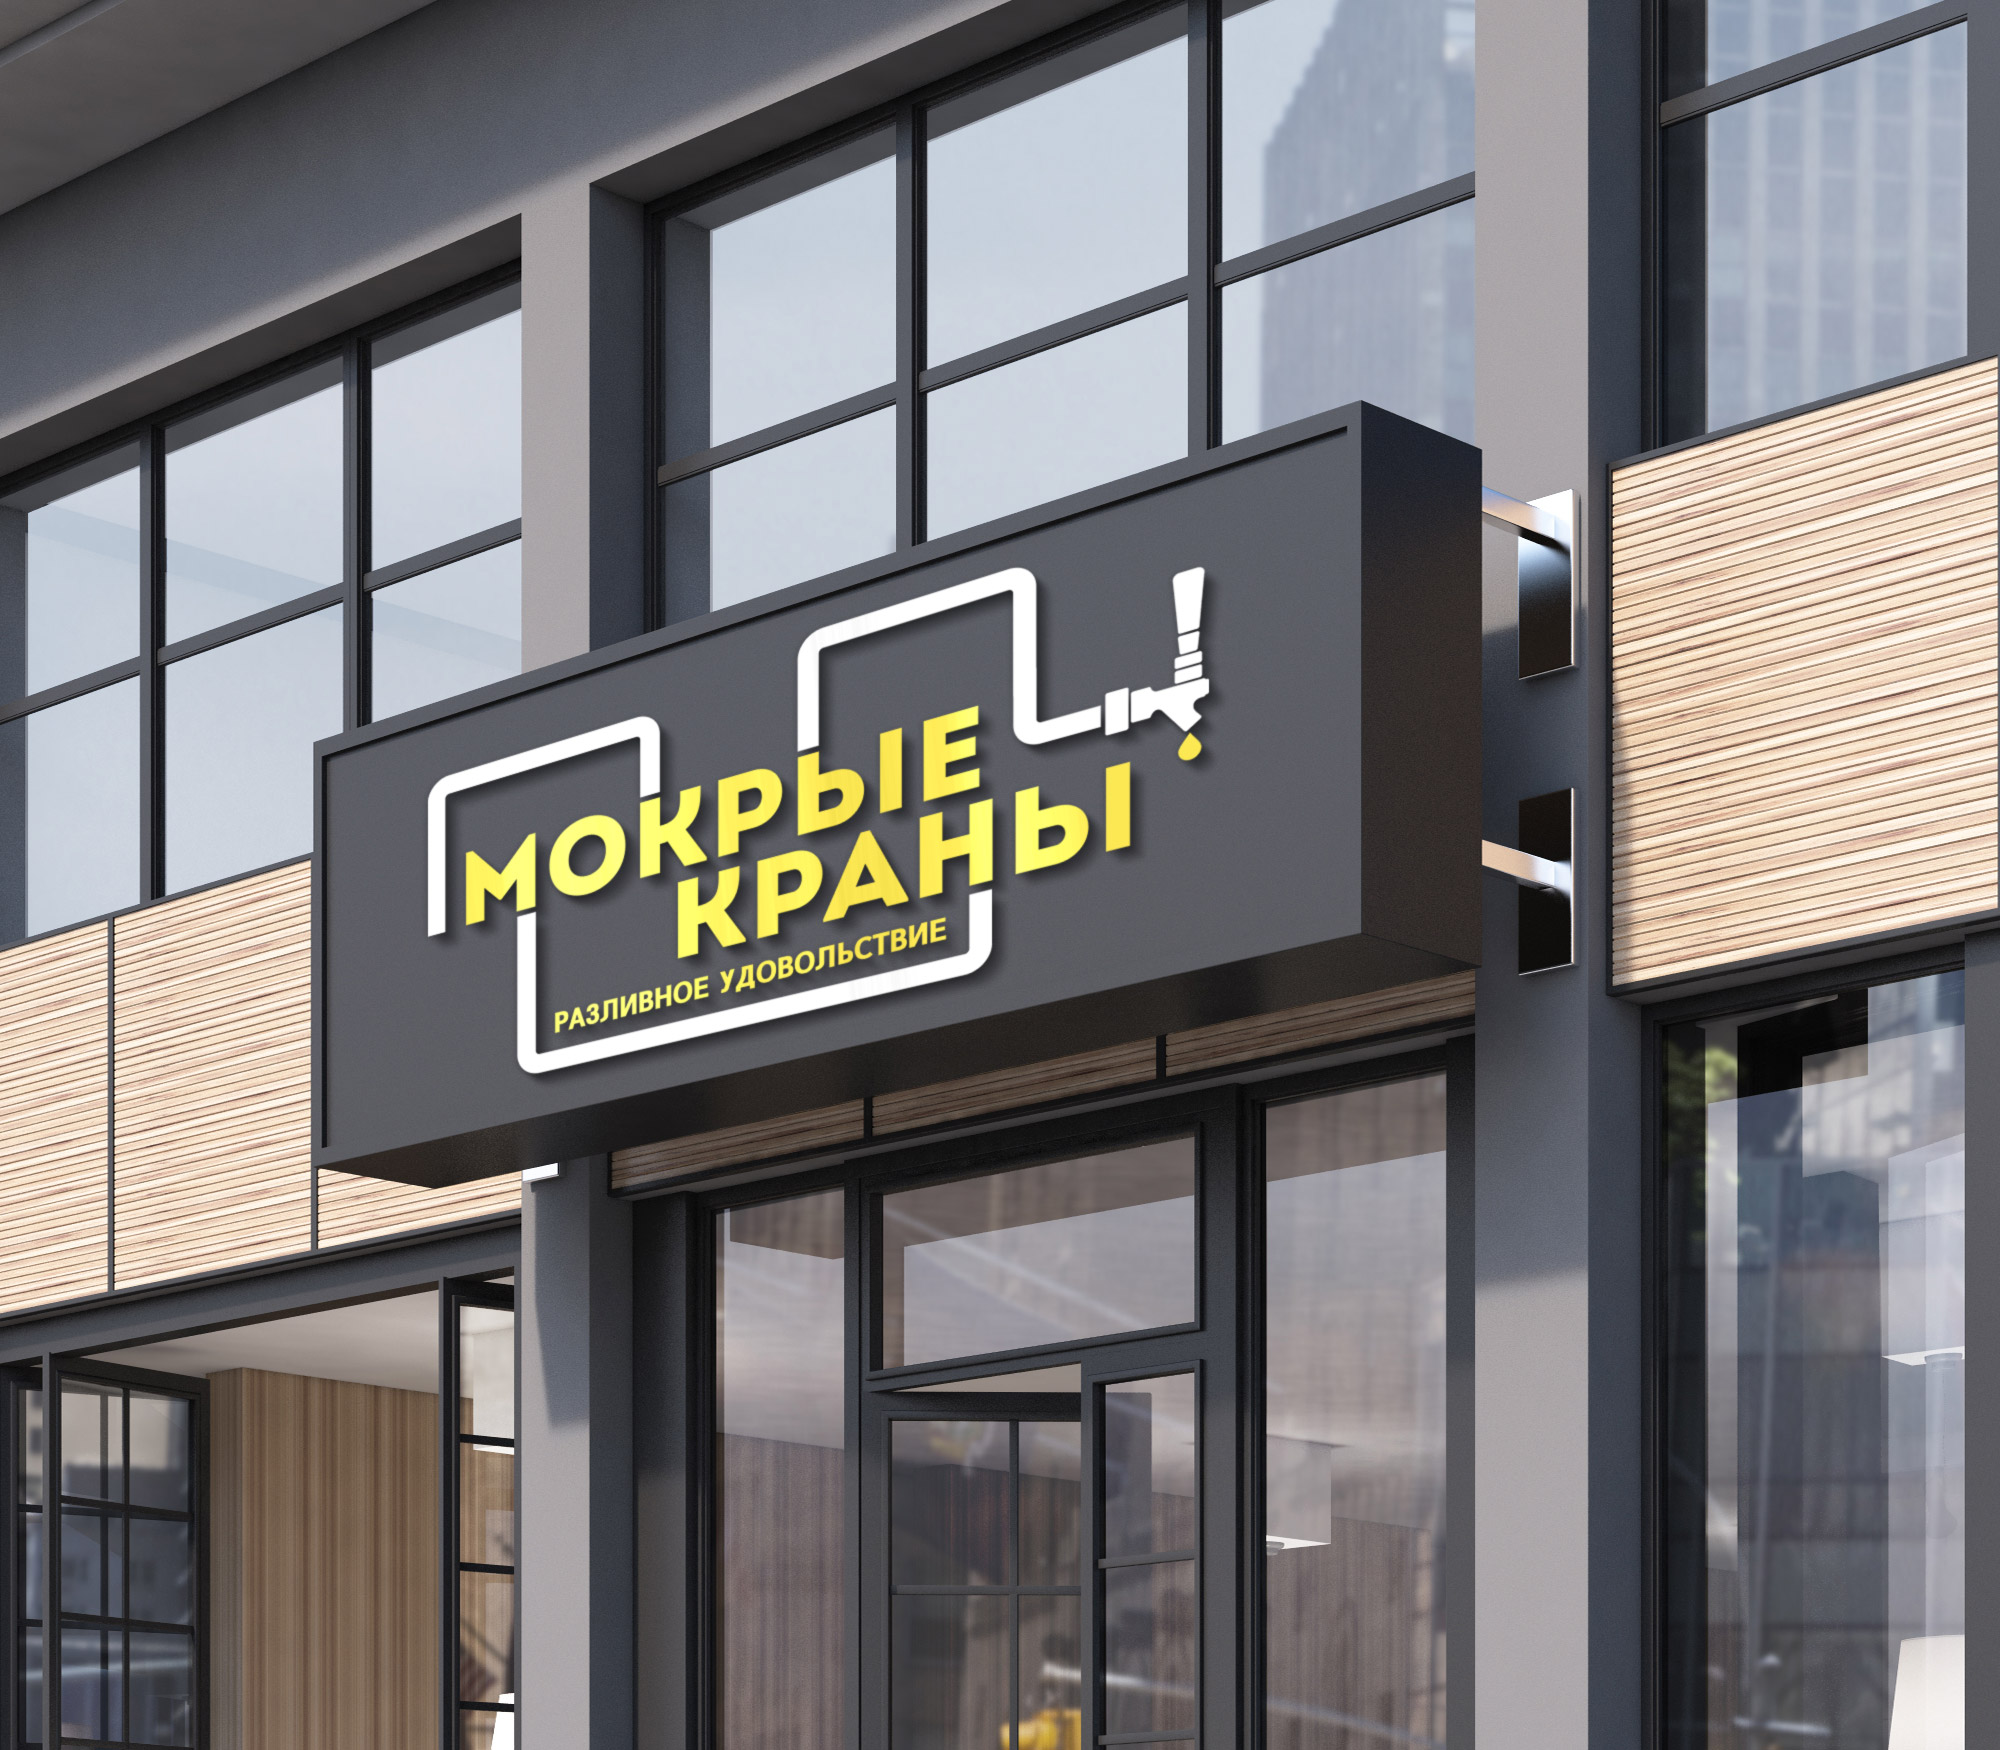 Вывеска/логотип для пивного магазина фото f_46560225066575b8.jpg